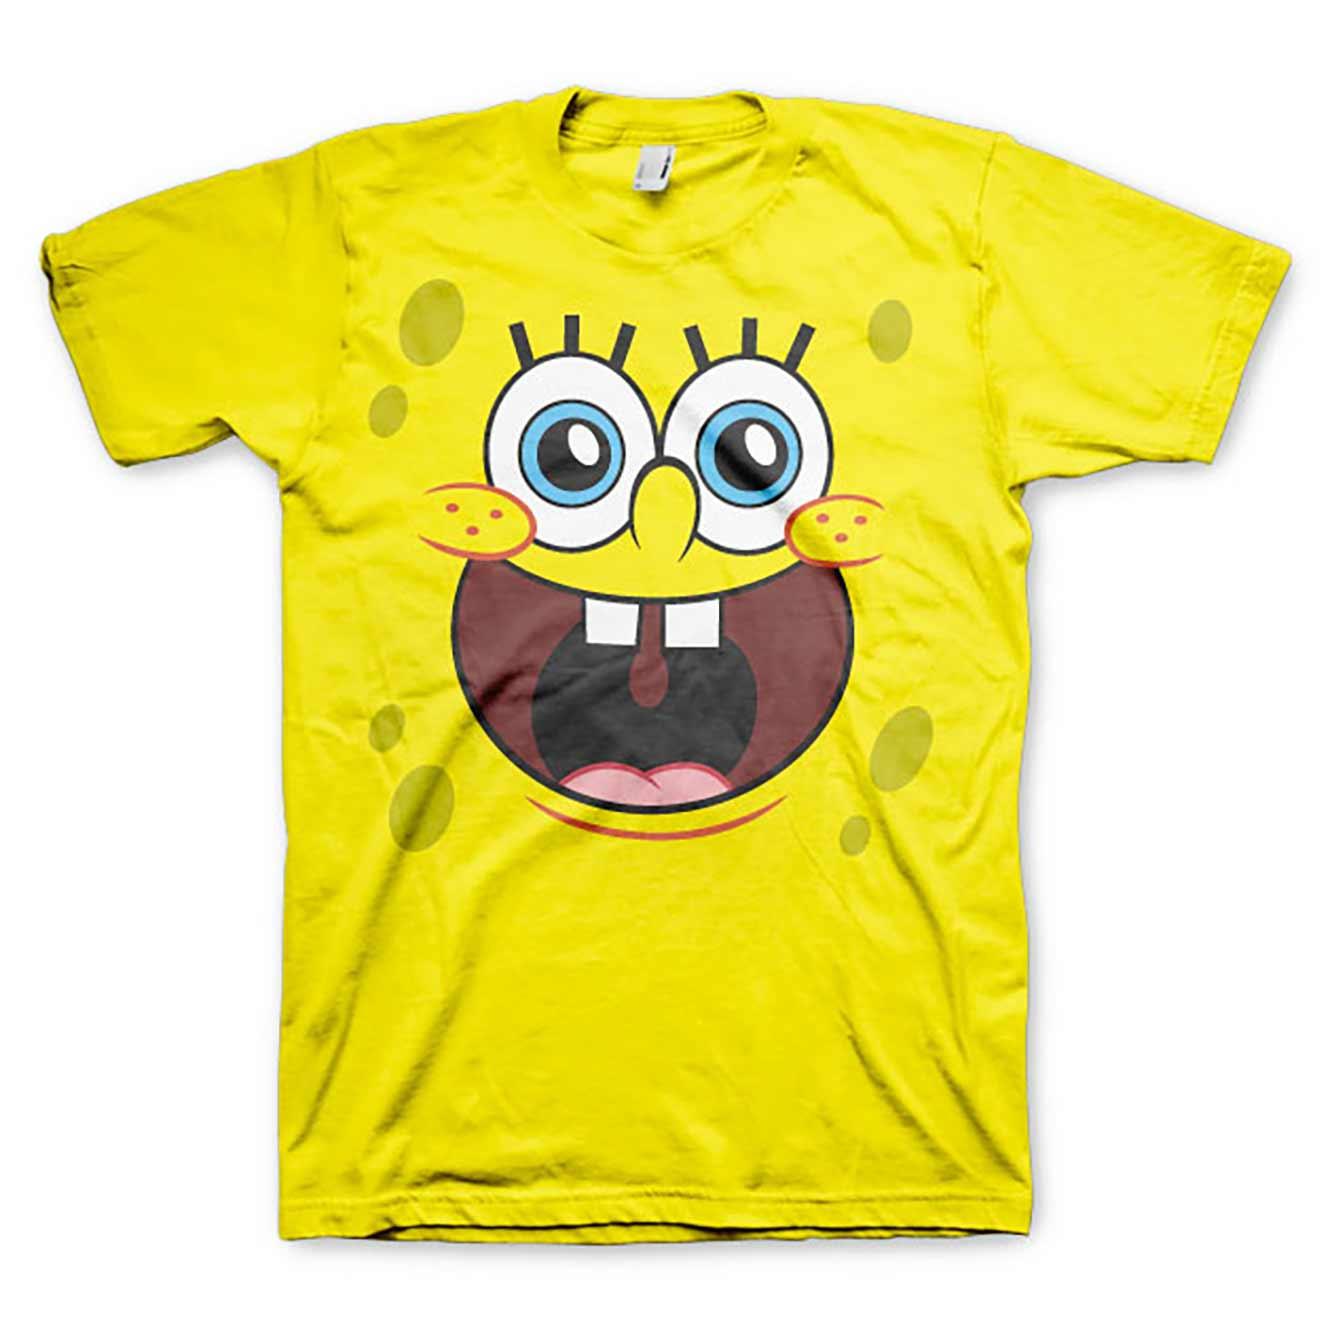 svampe-bob-firkant-t-shirt